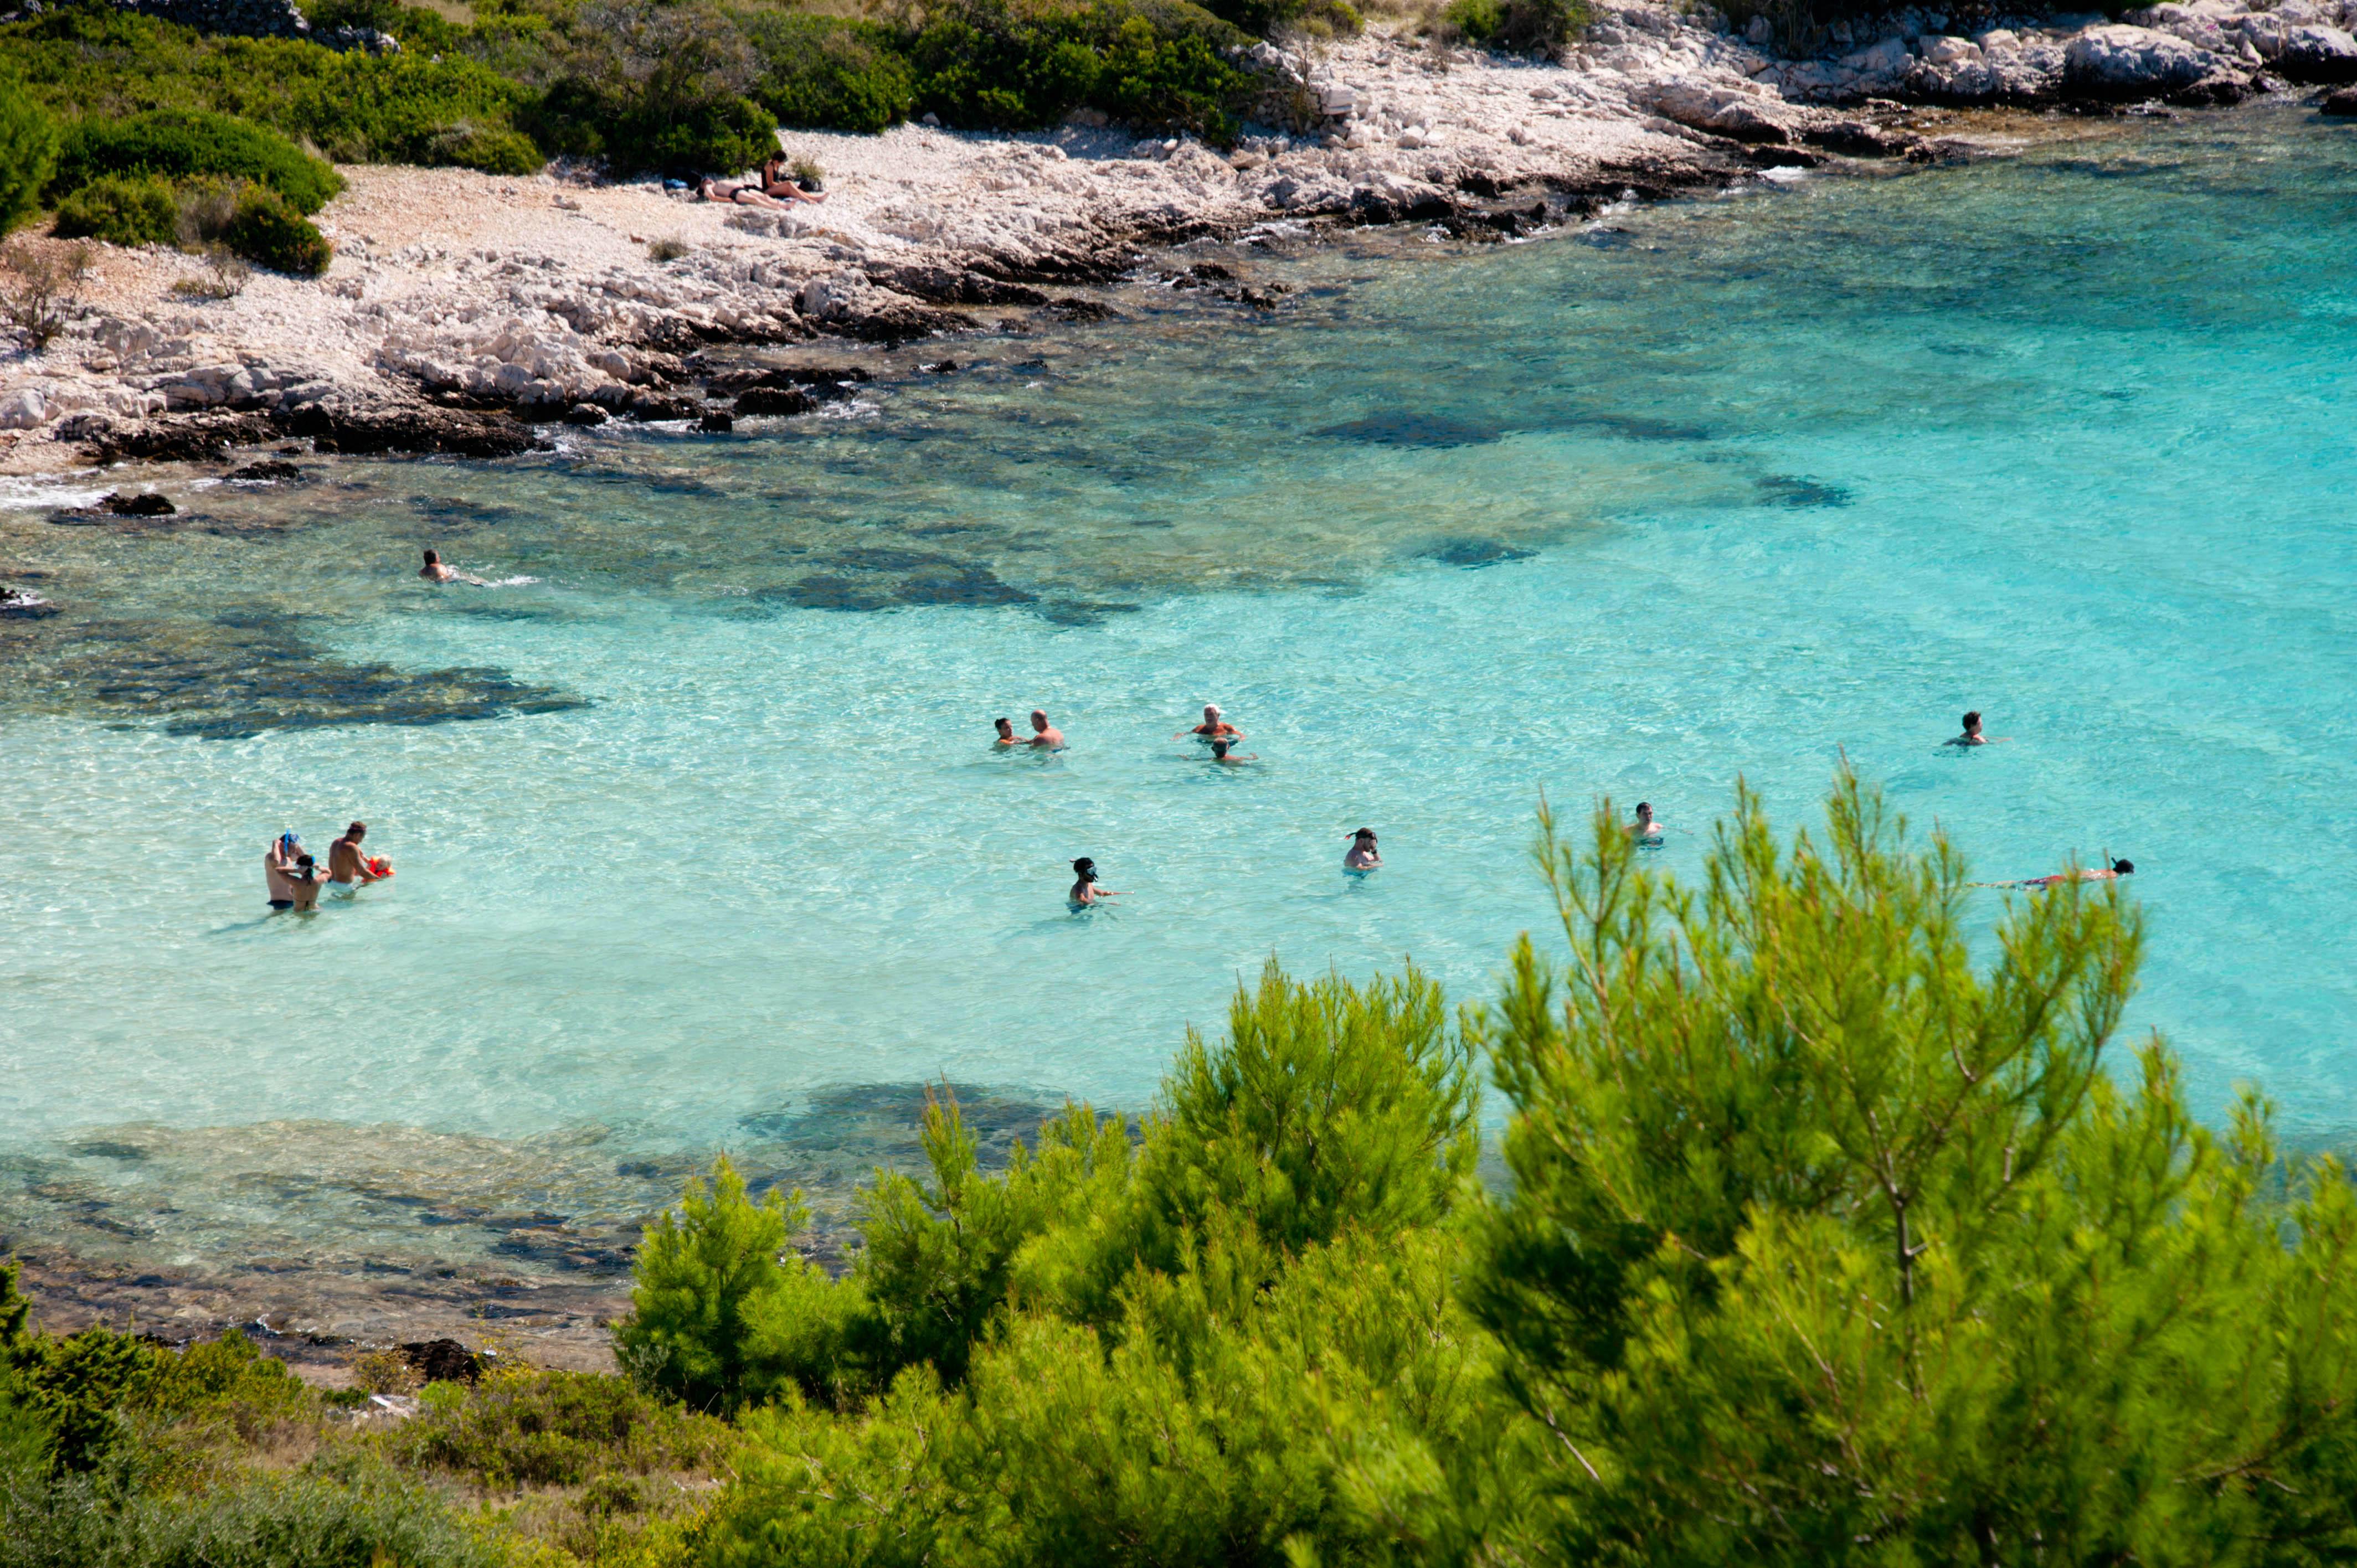 9698-Parc national iles Kornati (Dalmatie du Nord)